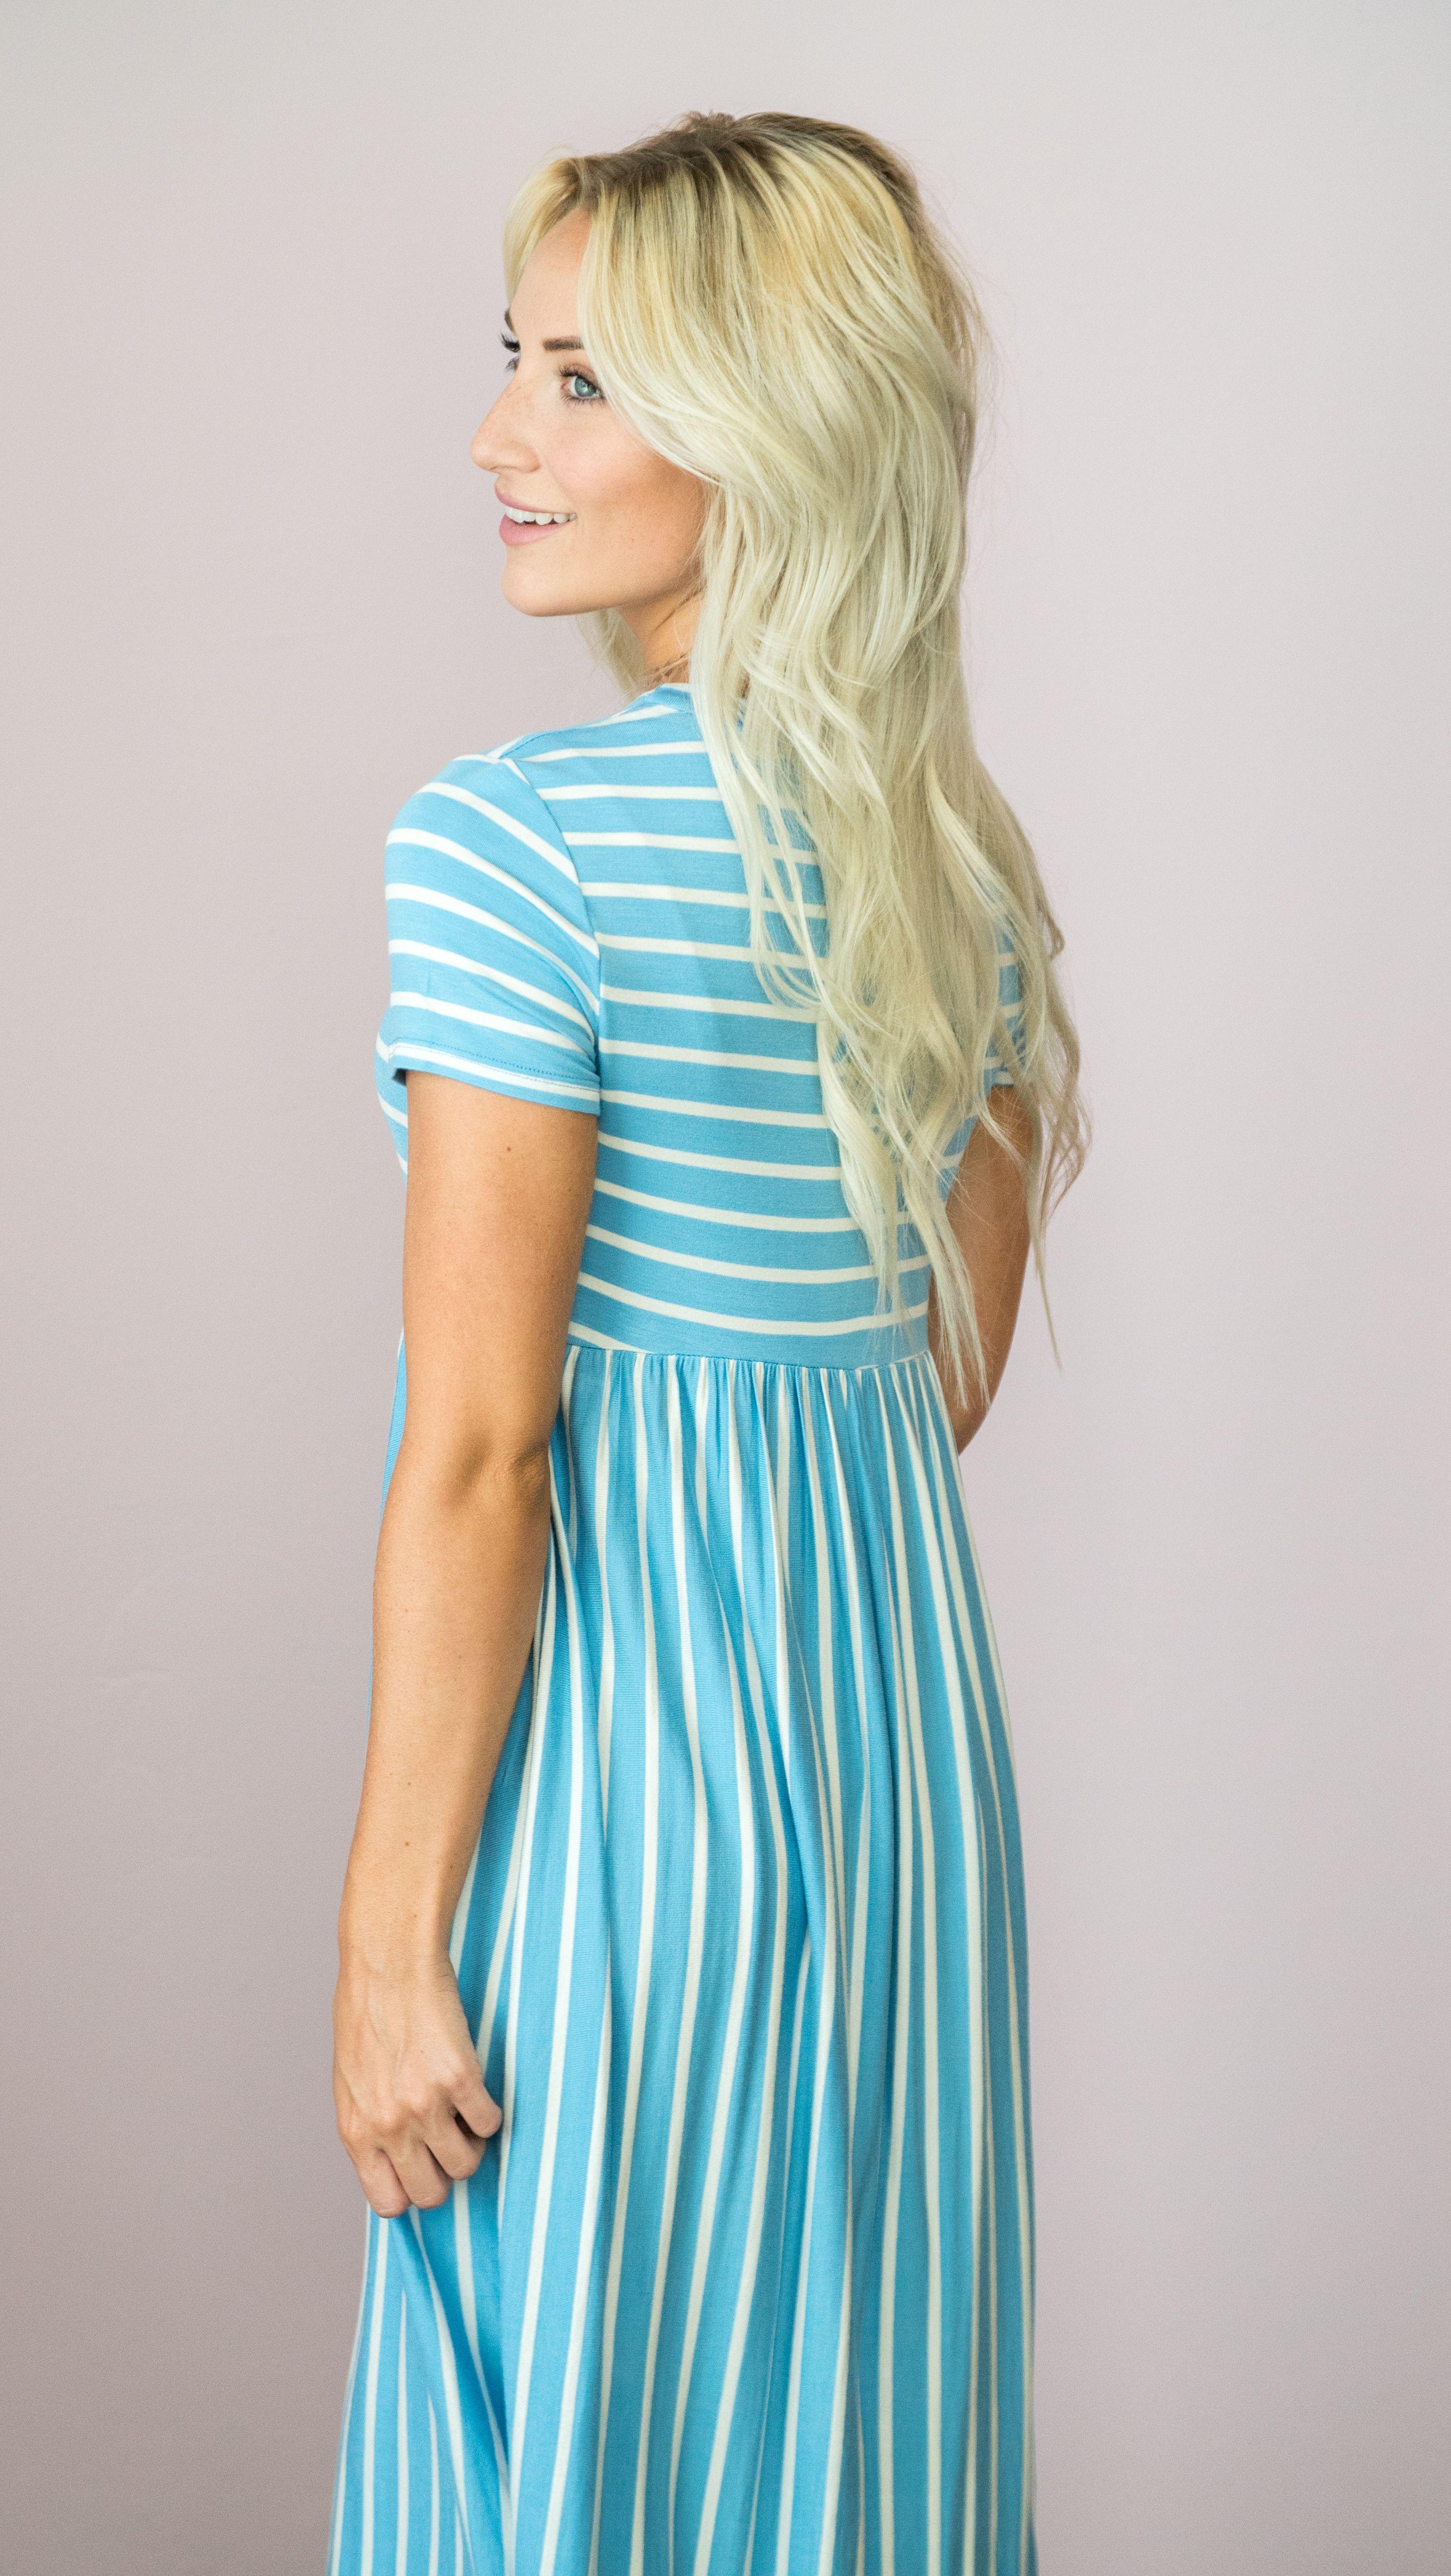 Baby doll blue dress dresses blue dresses short sleeve